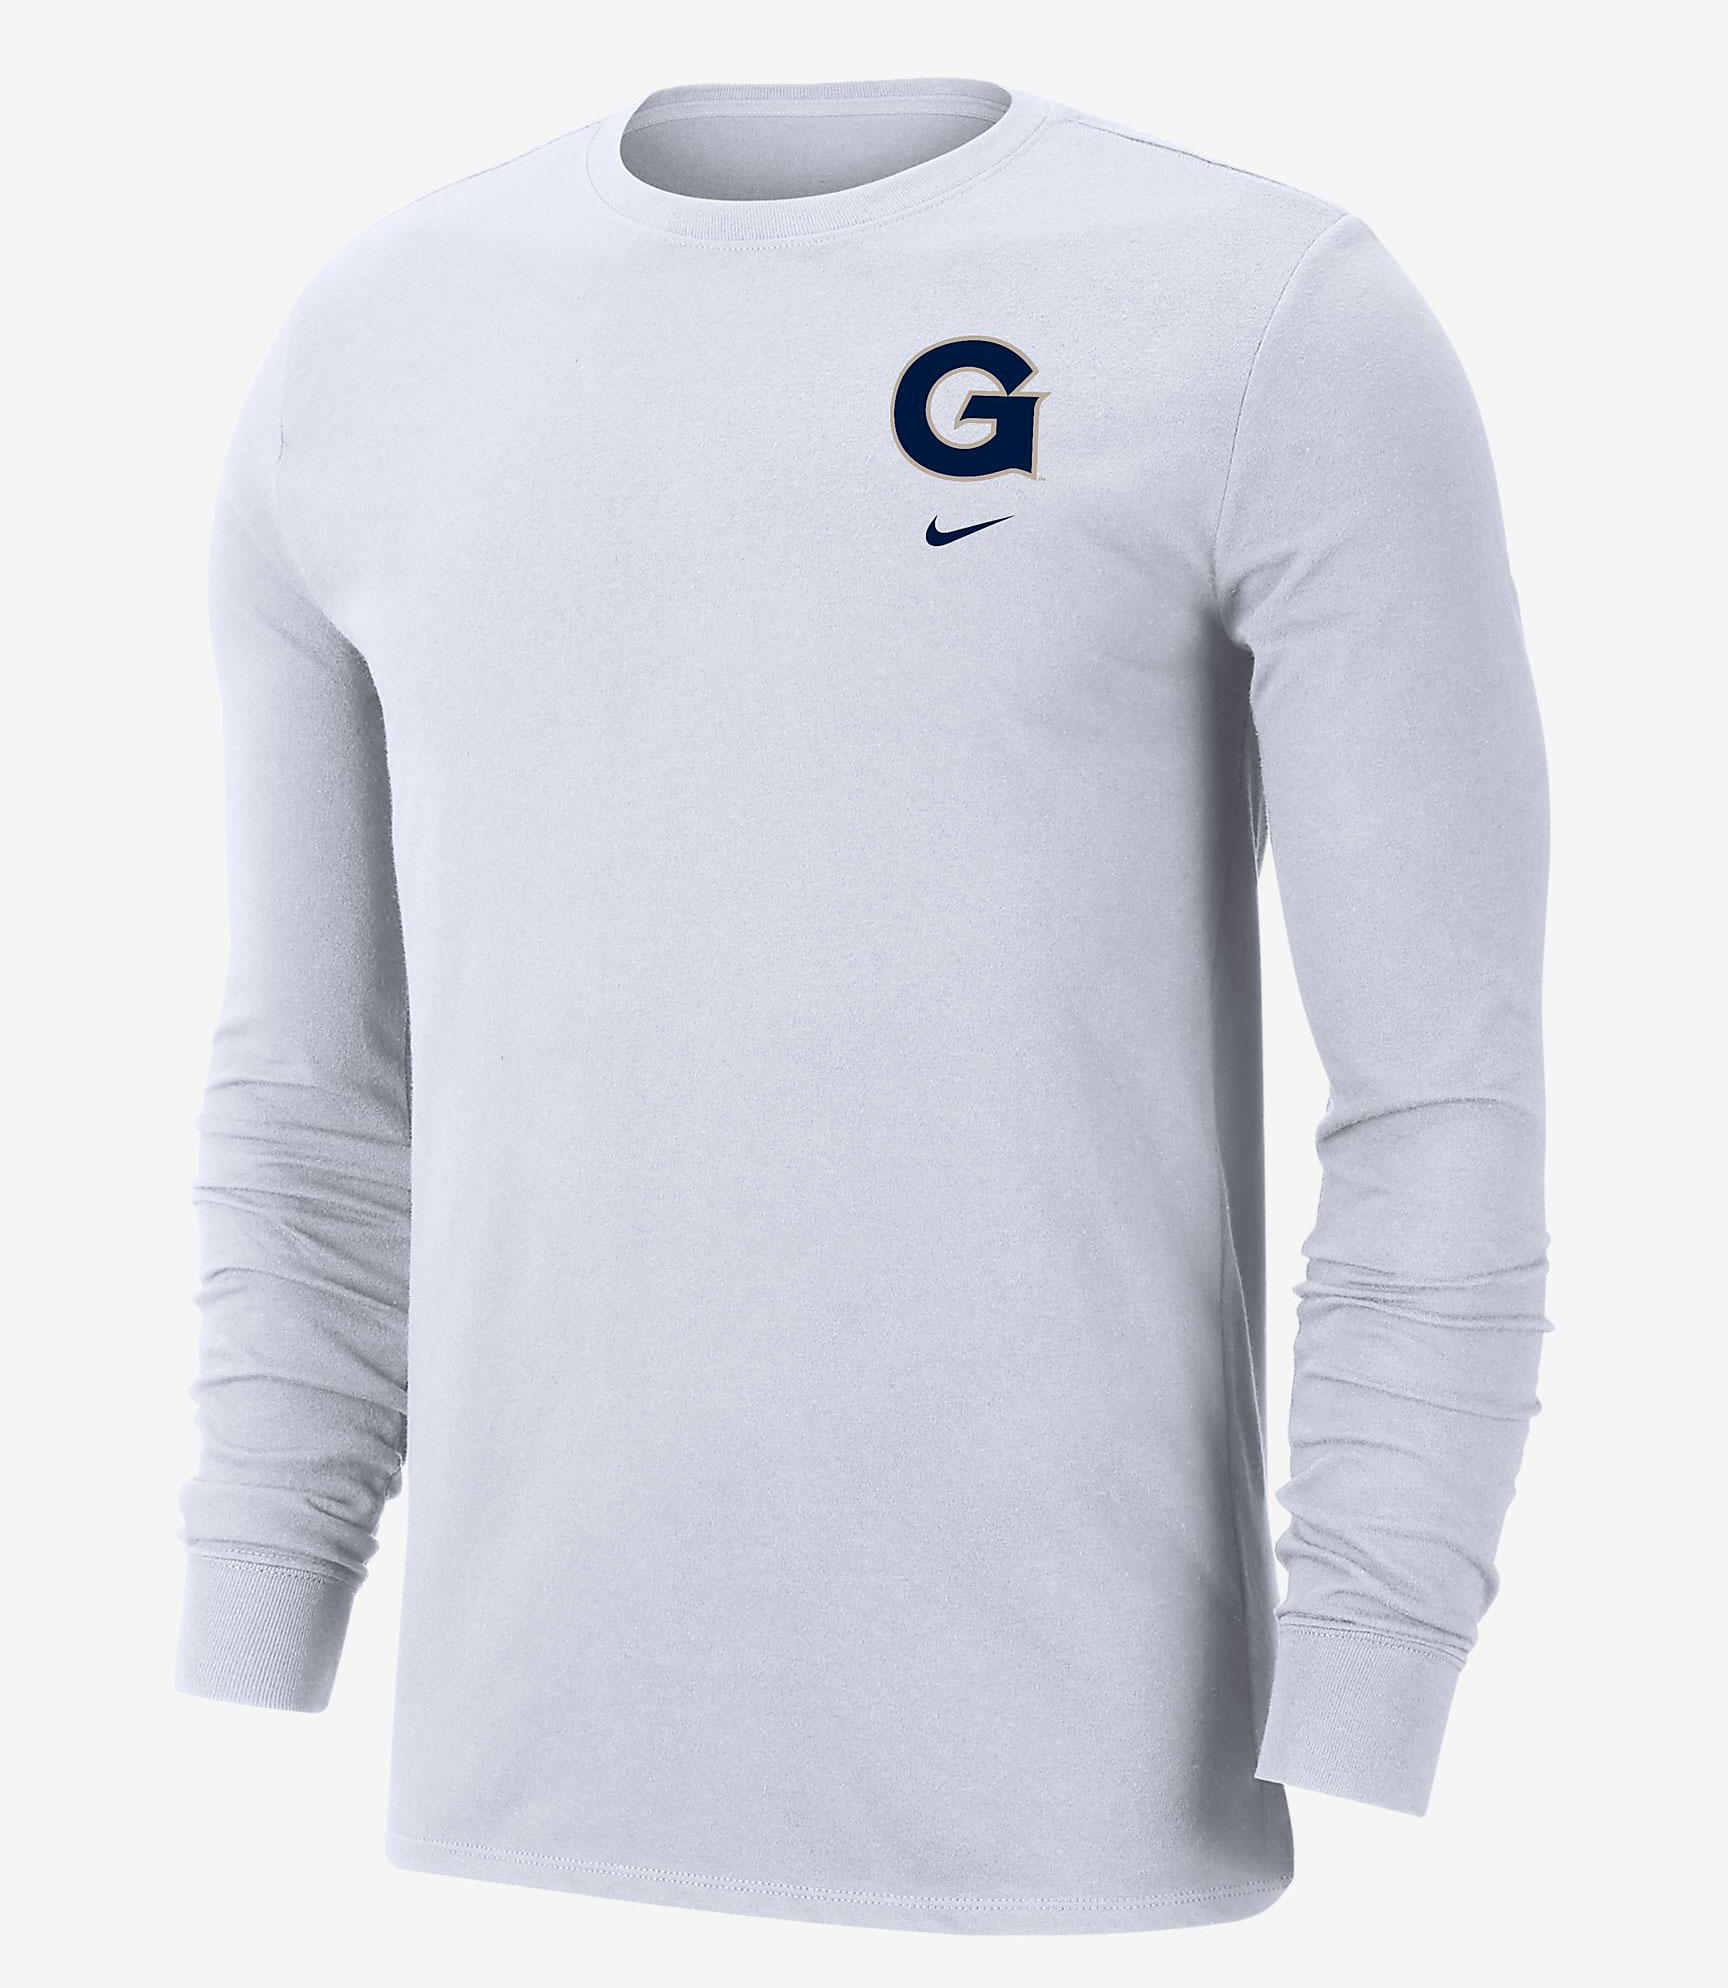 georgetown-hoyas-nike-long-sleeve-shirt